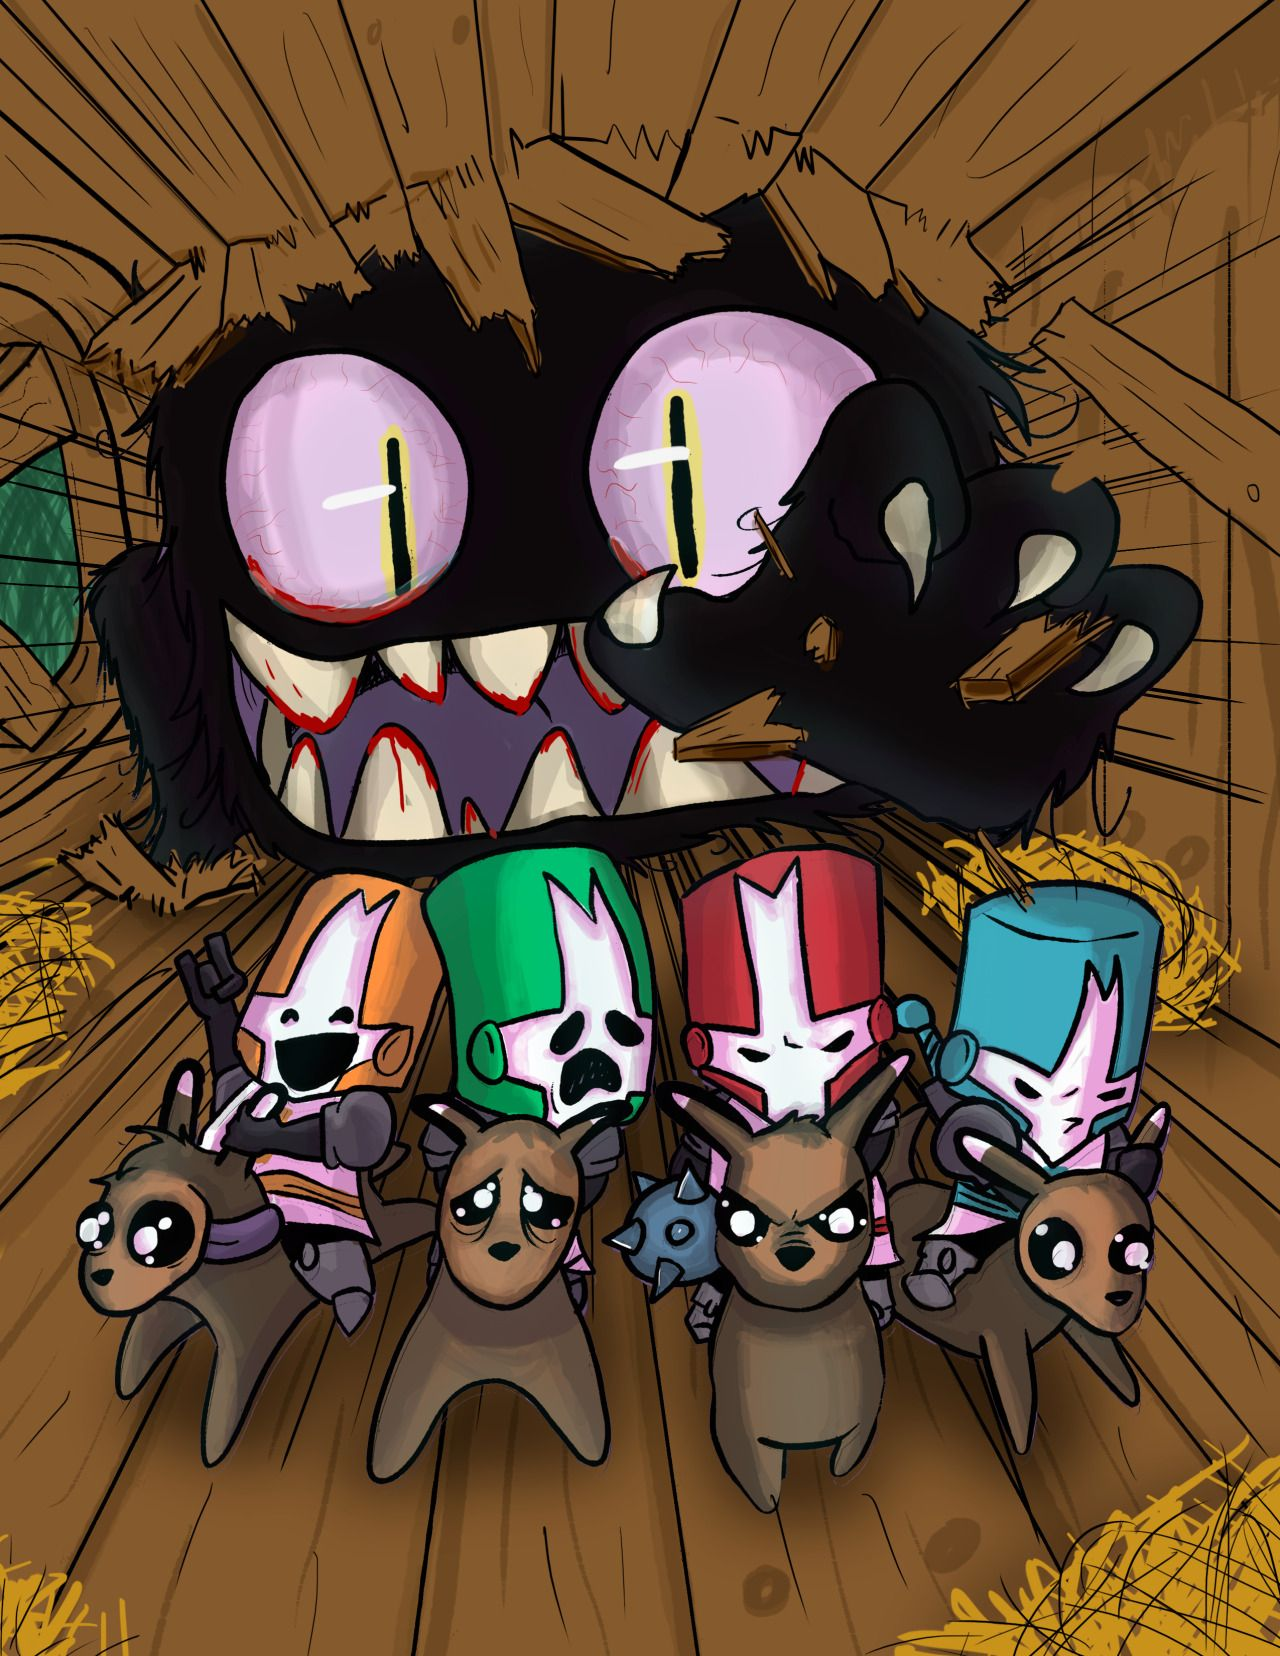 Castle crashers fanart cartoon toon the behemoth - Castle crashers anime ...